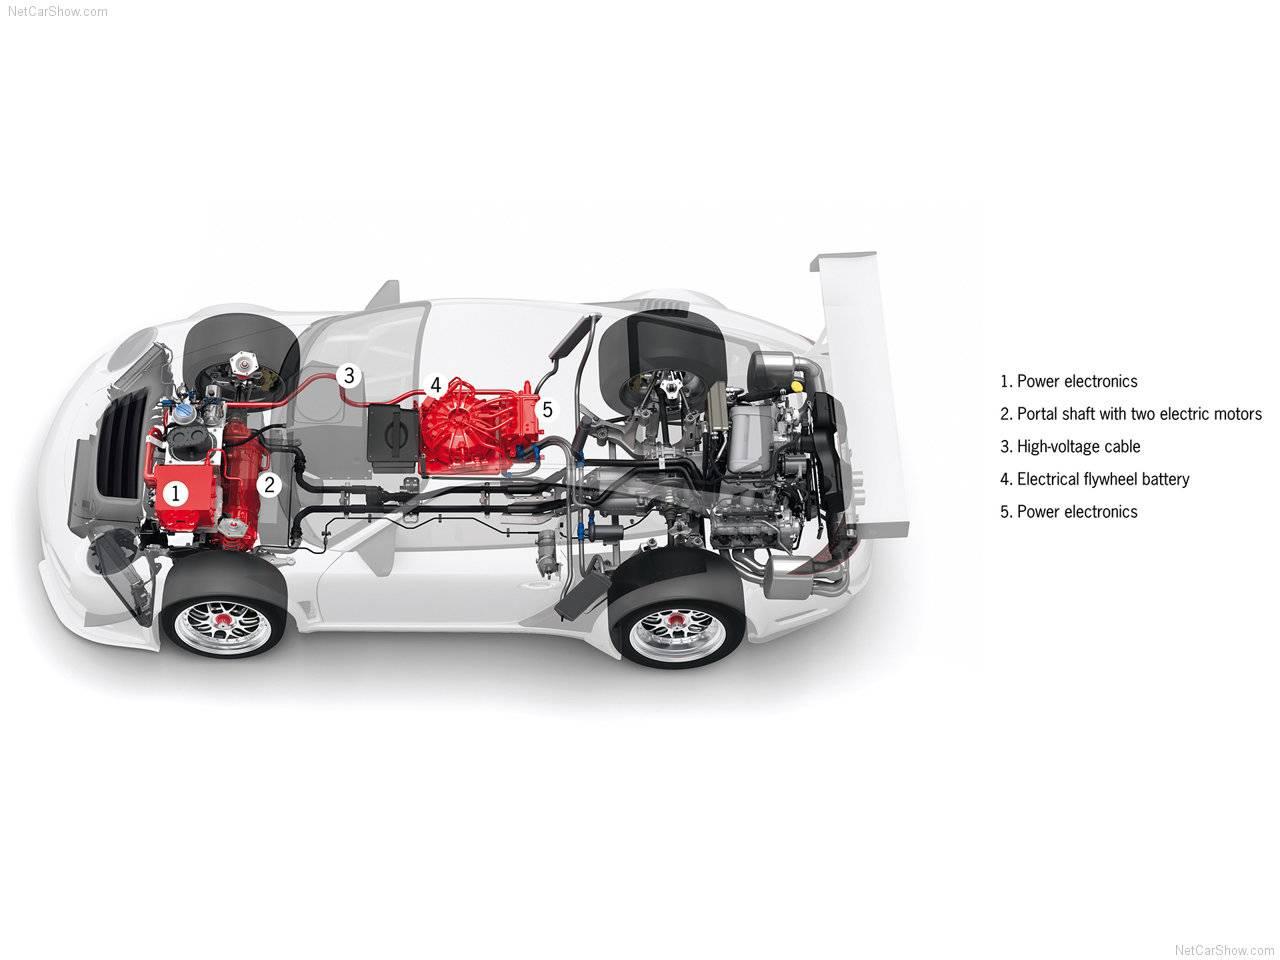 http://1.bp.blogspot.com/_lsyt_wQ2awY/TDrBtf6n4dI/AAAAAAAB9v4/oNsrbfEzfGo/s1600/Porsche-911_GT3_R_Hybrid_2011_1280x960_wallpaper_06.jpg